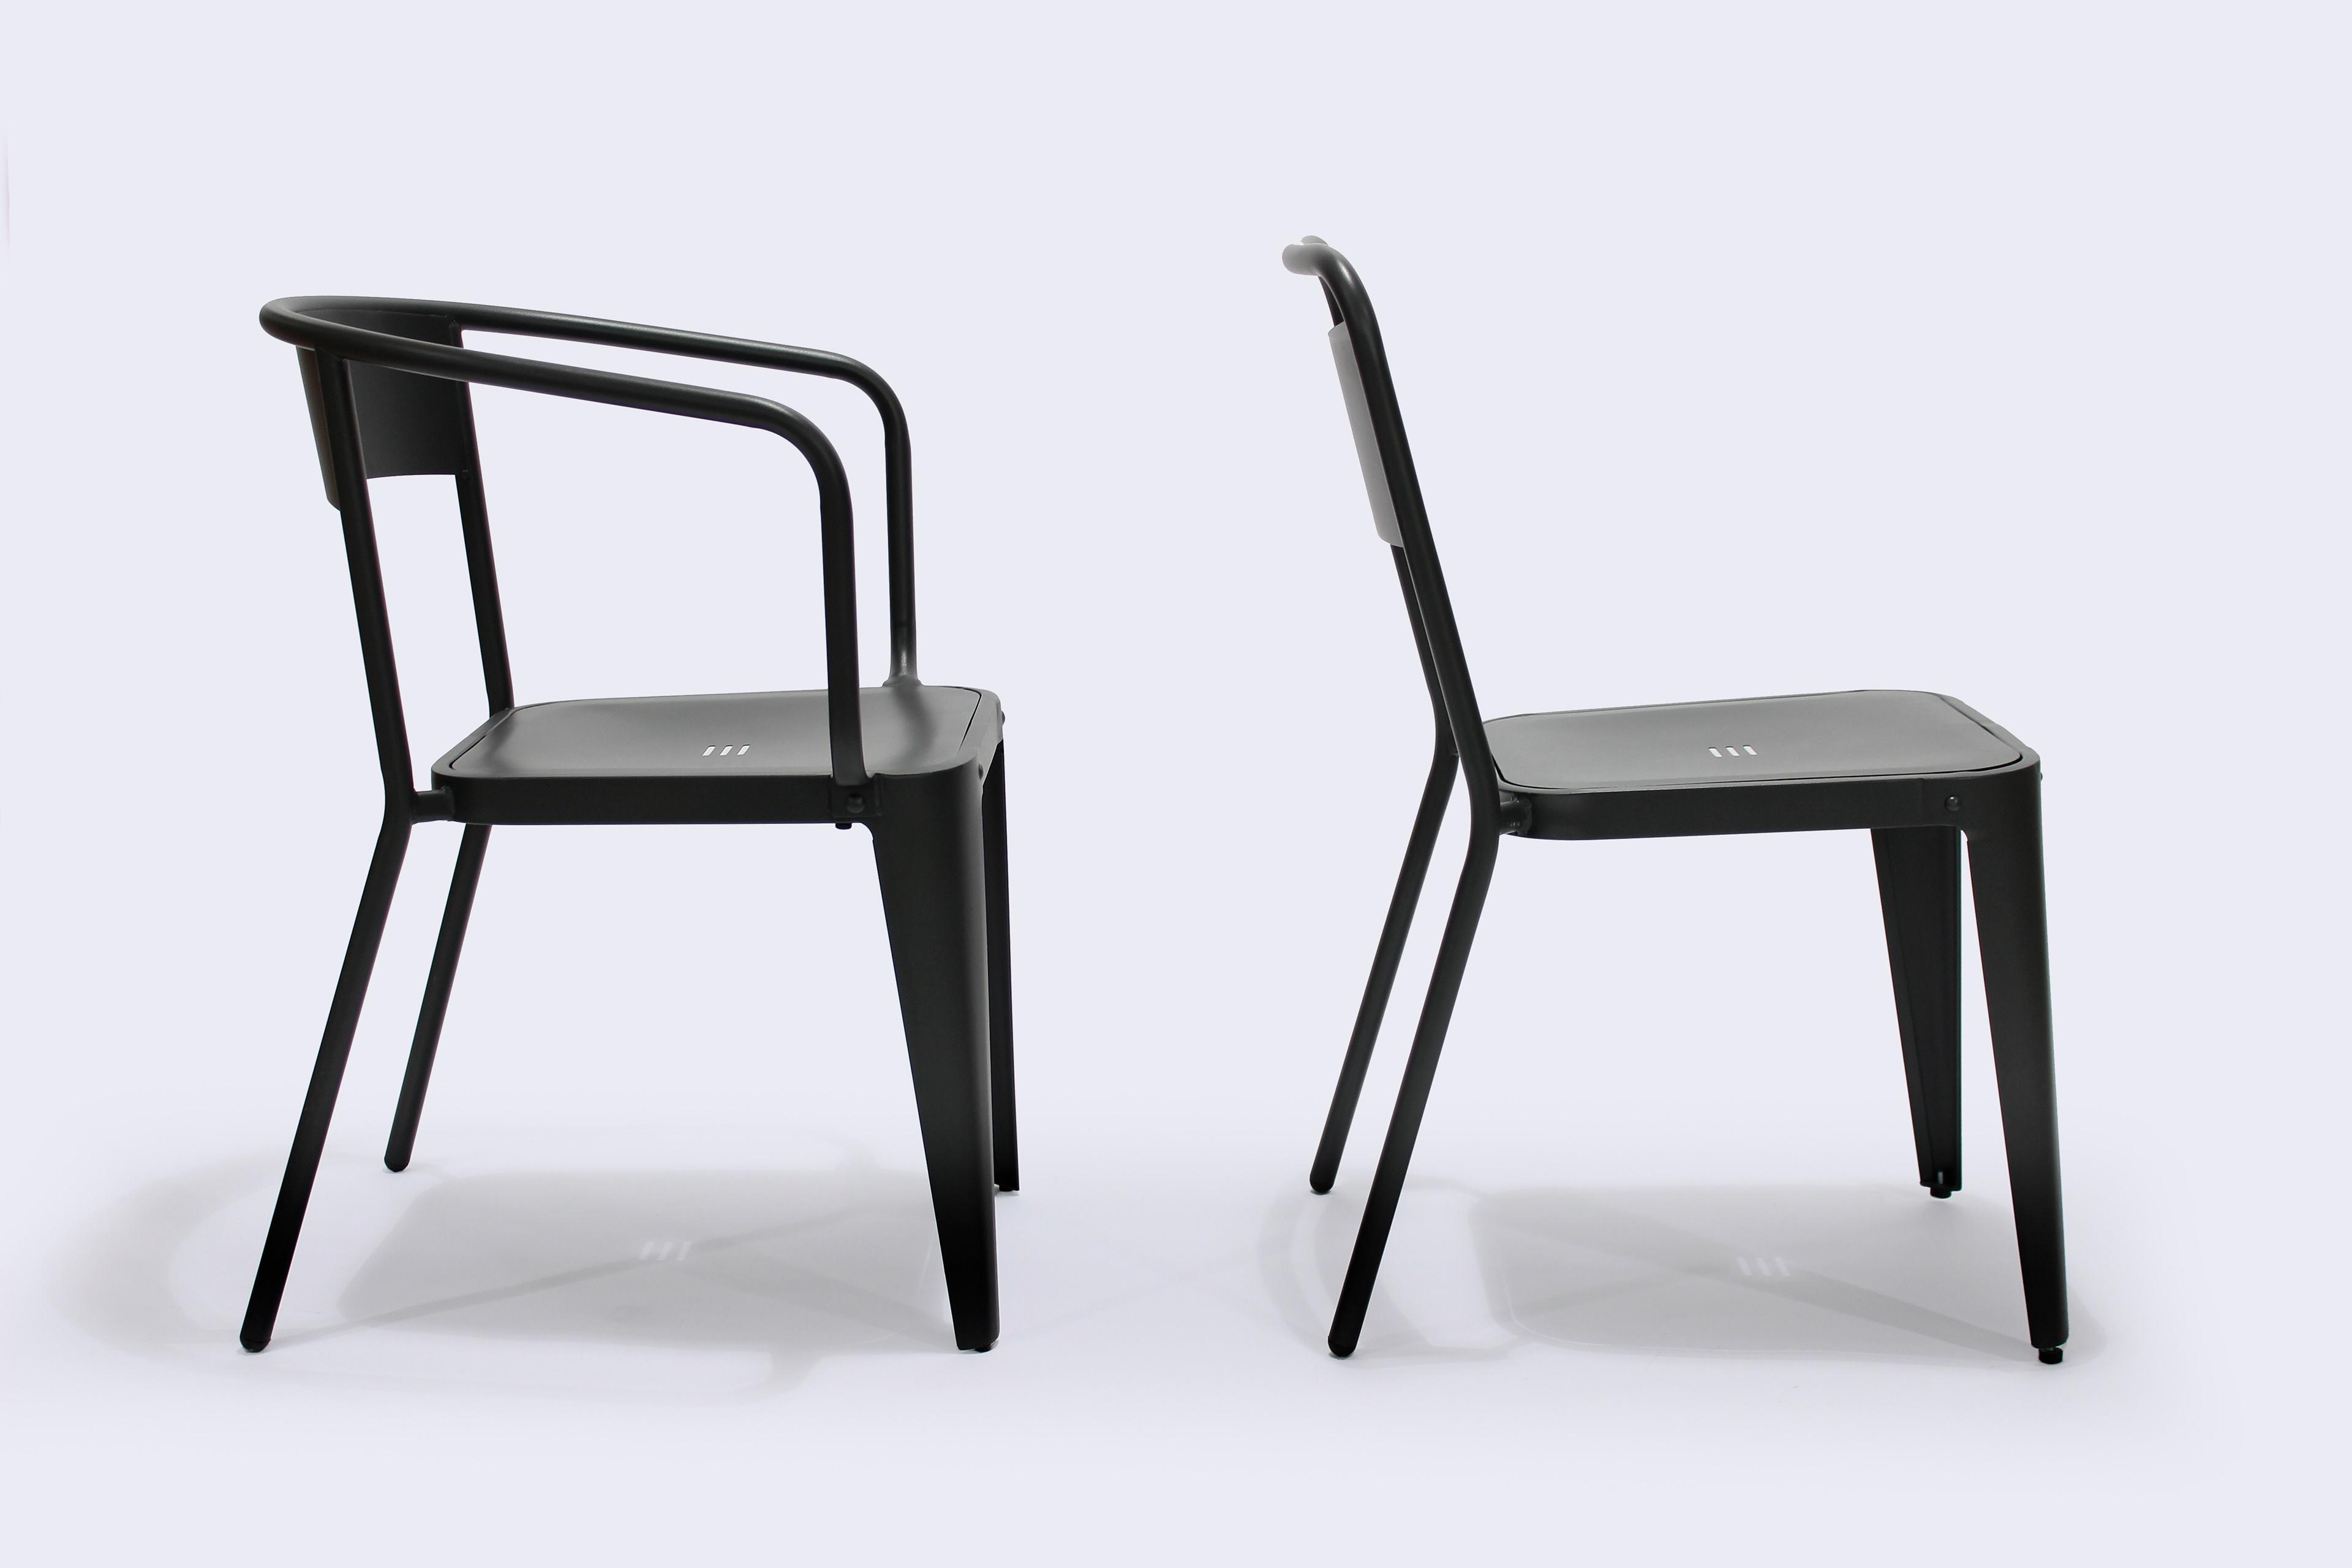 designbycarrefour le fauteuil industriel. Black Bedroom Furniture Sets. Home Design Ideas